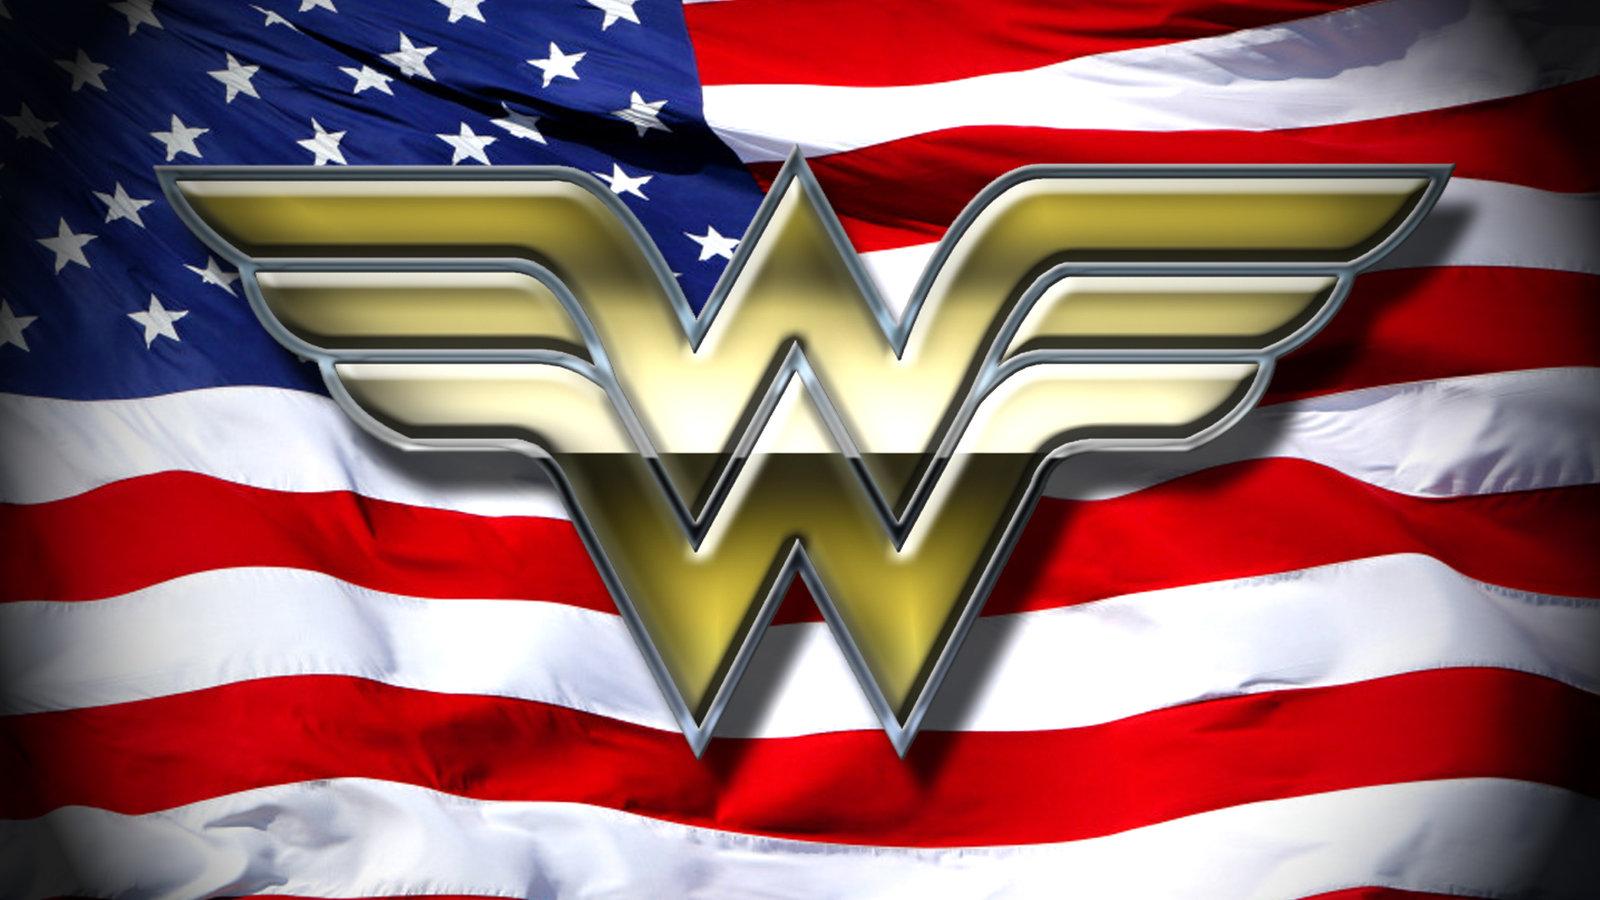 Wonder Woman logo by Balsavor 1600x900